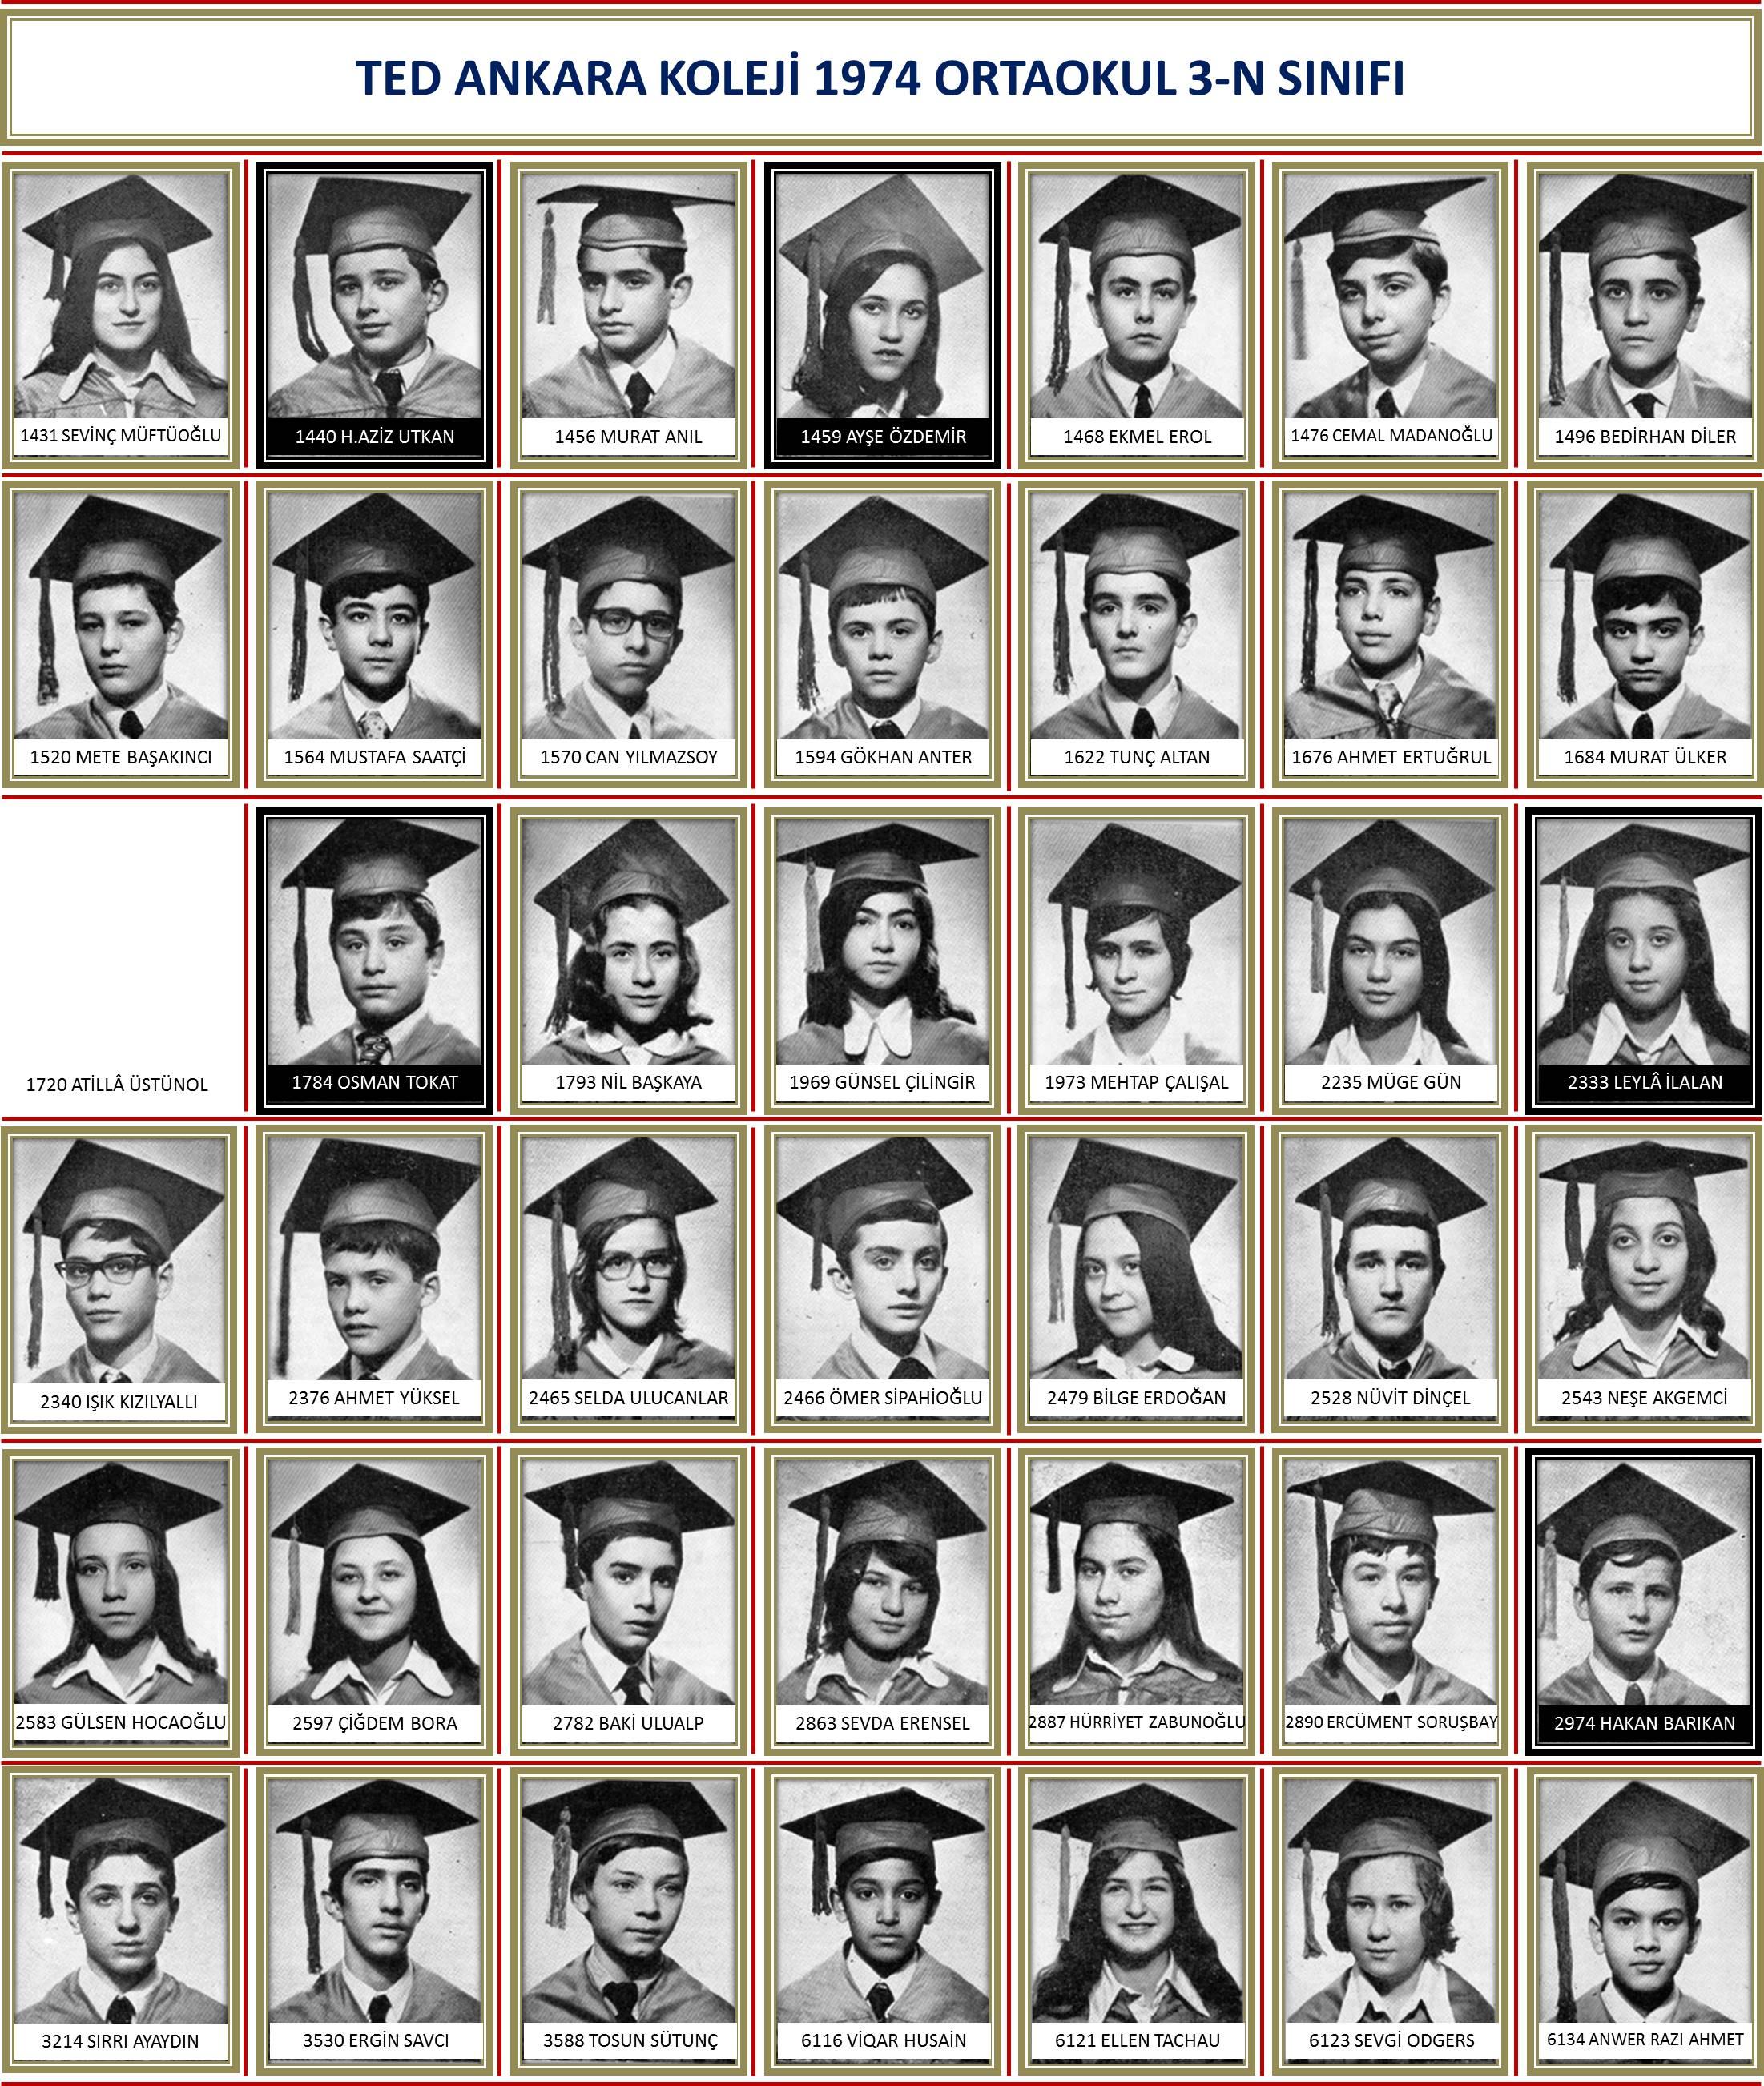 1974 3-N Sınıf toplu beyaz zemin Rev01